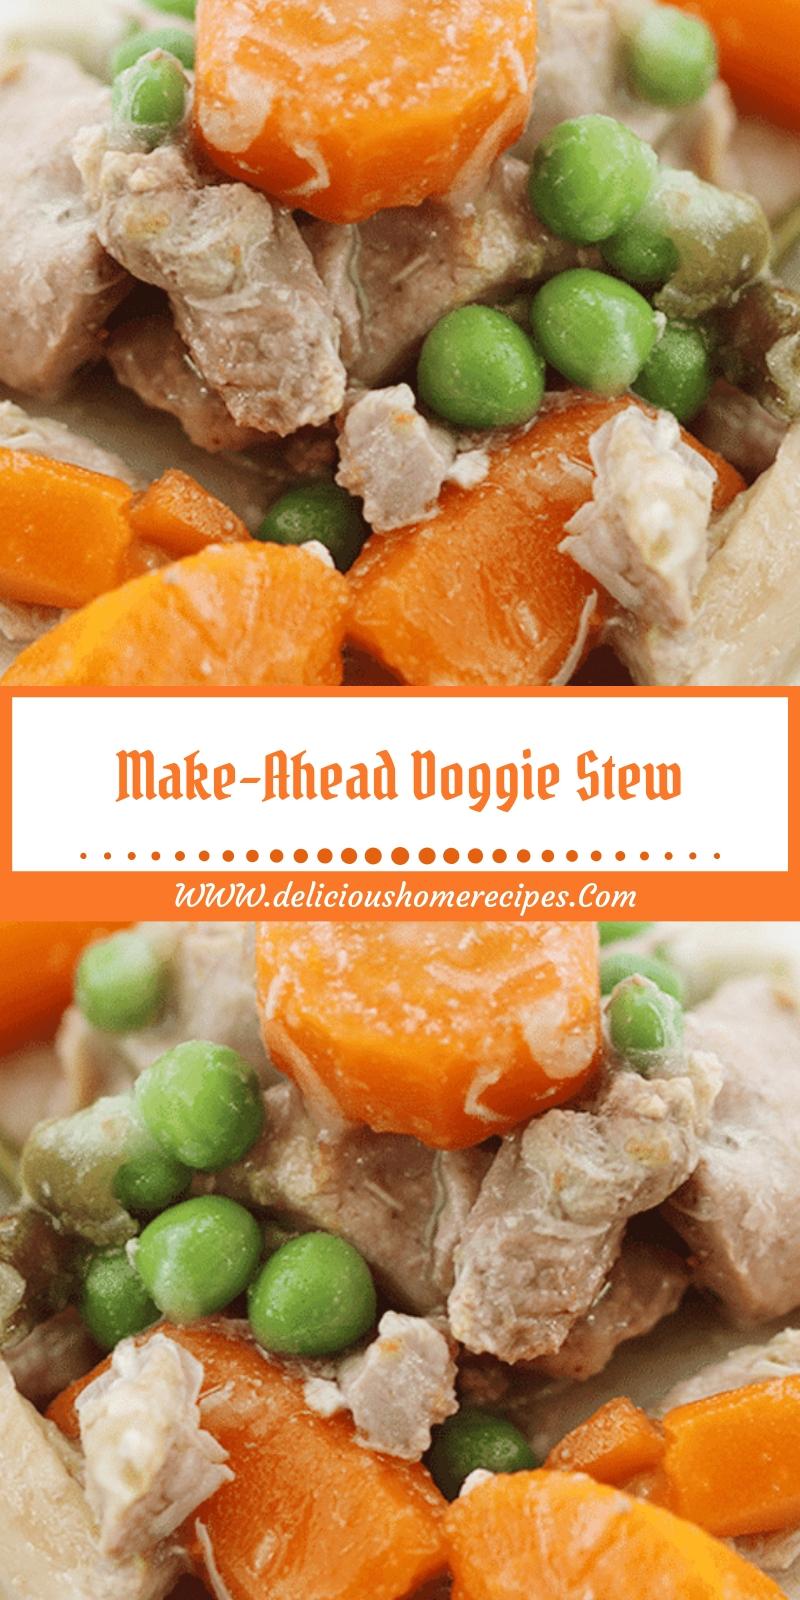 Make-Ahead Doggie Stew